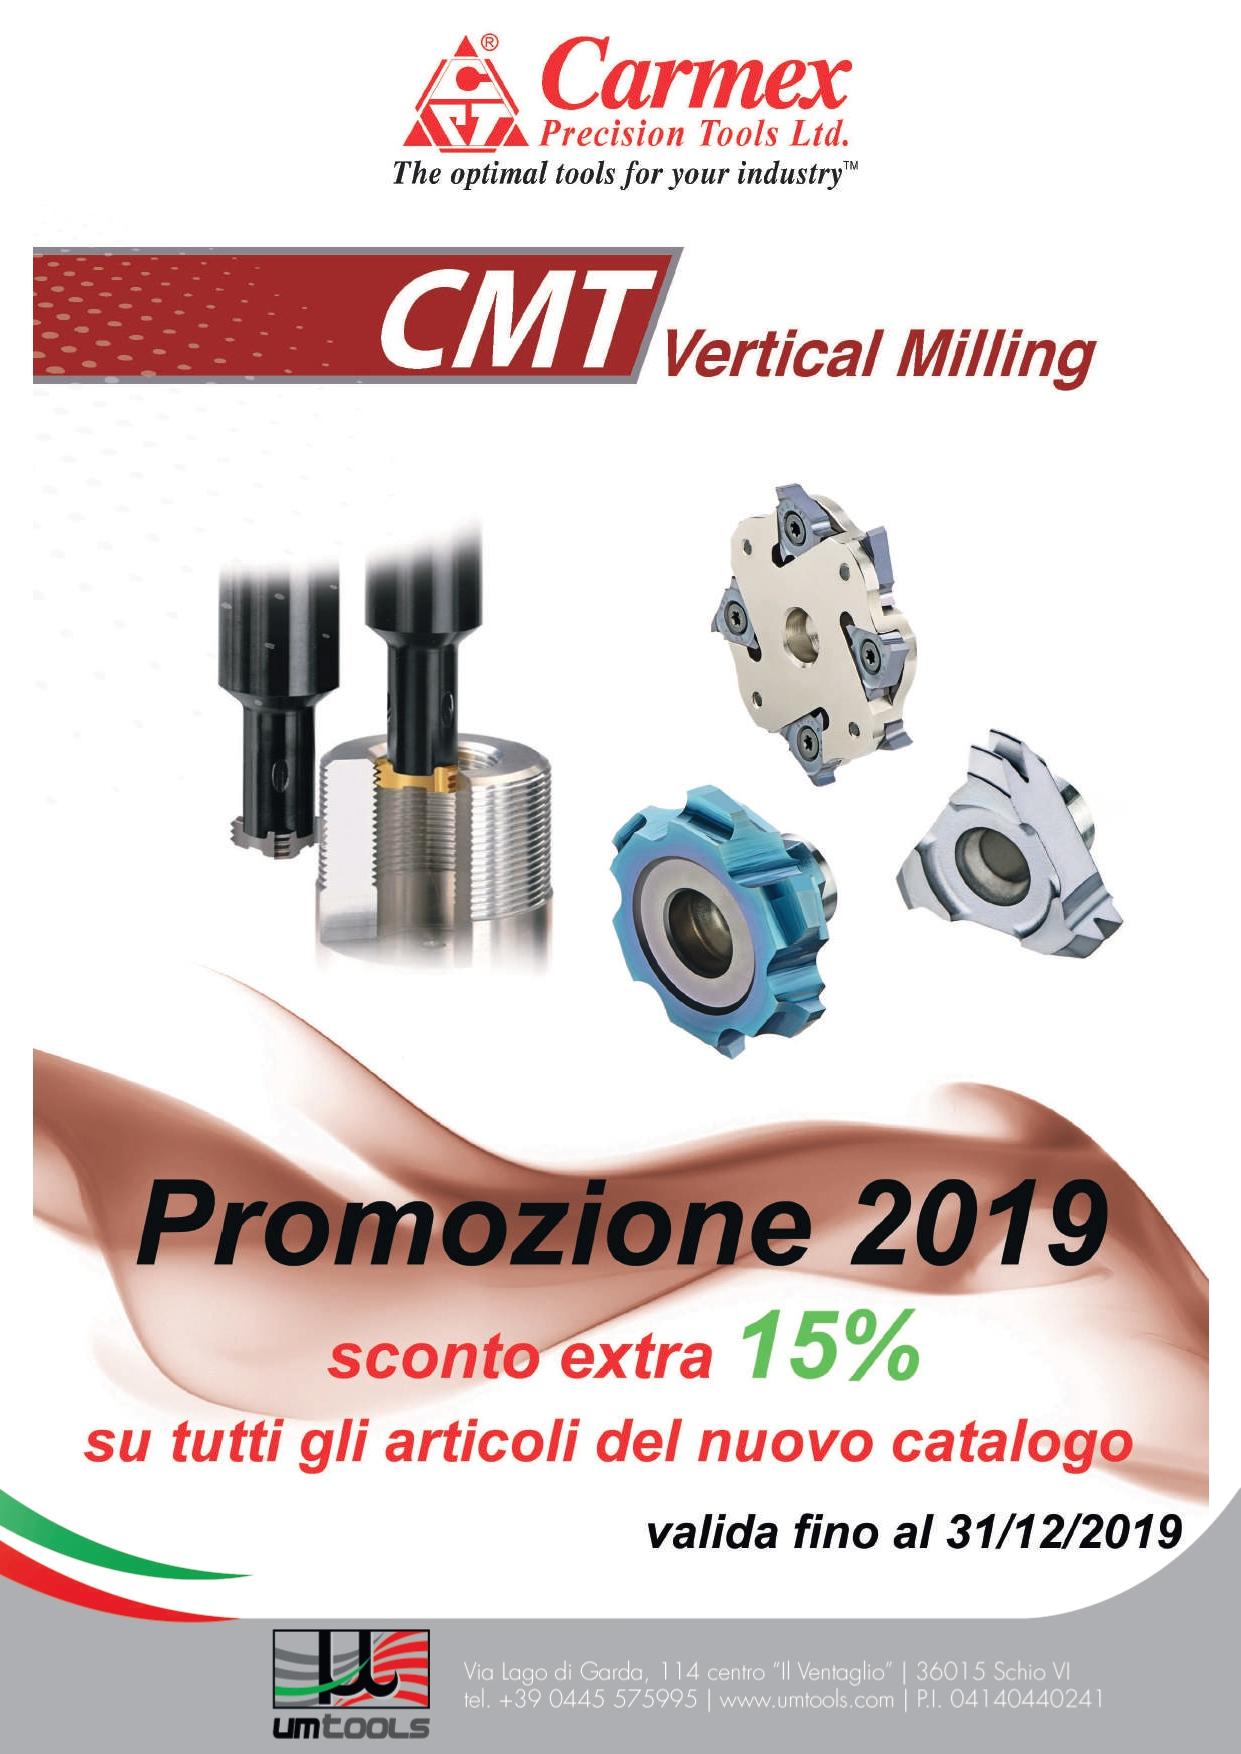 promozione-Carmex_CMT_fresatura-verticale